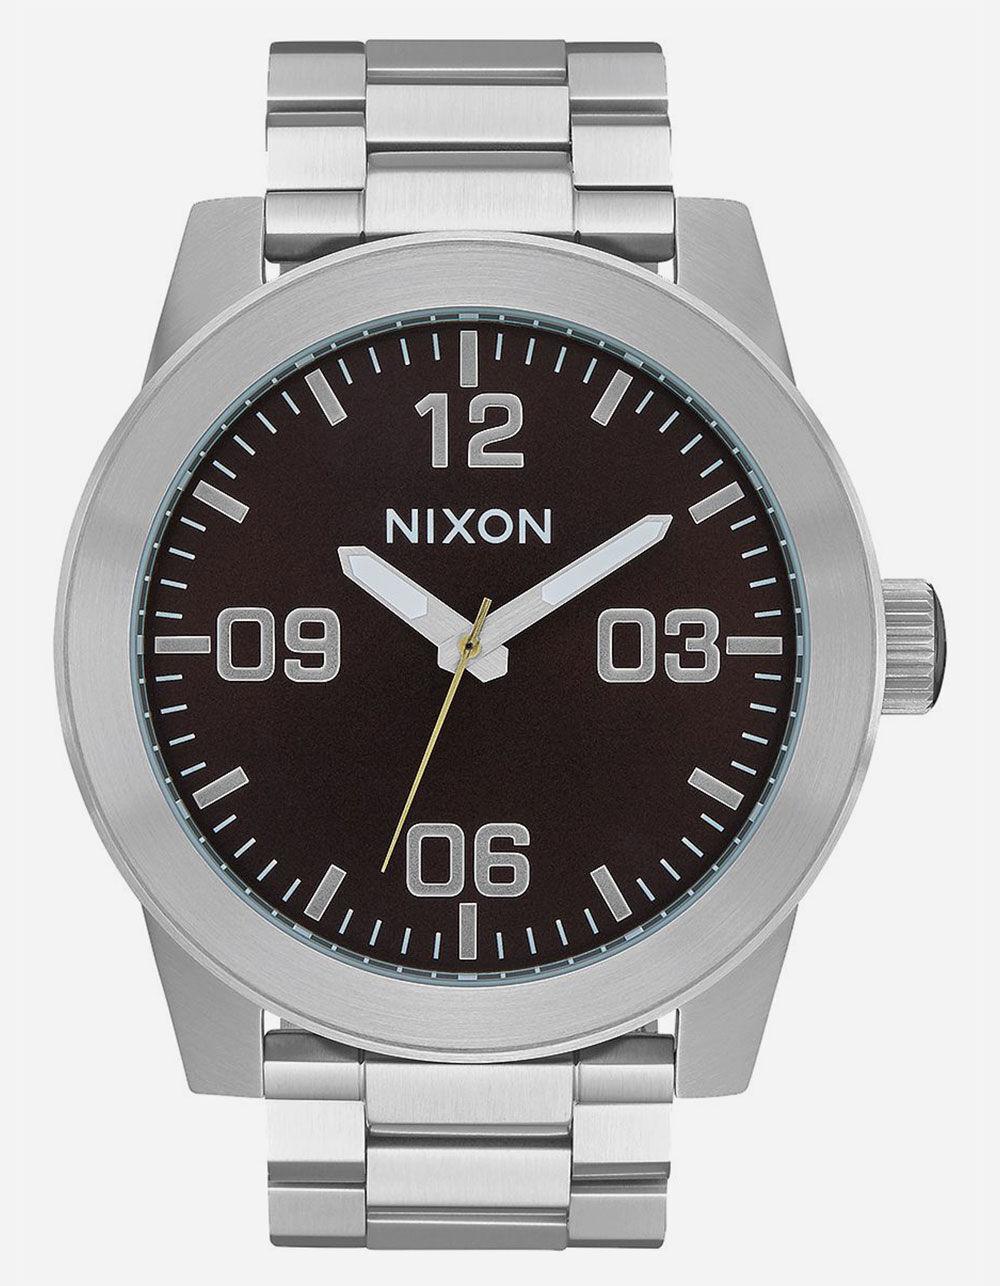 NIXON Corporal SS Dark Cedar Watch